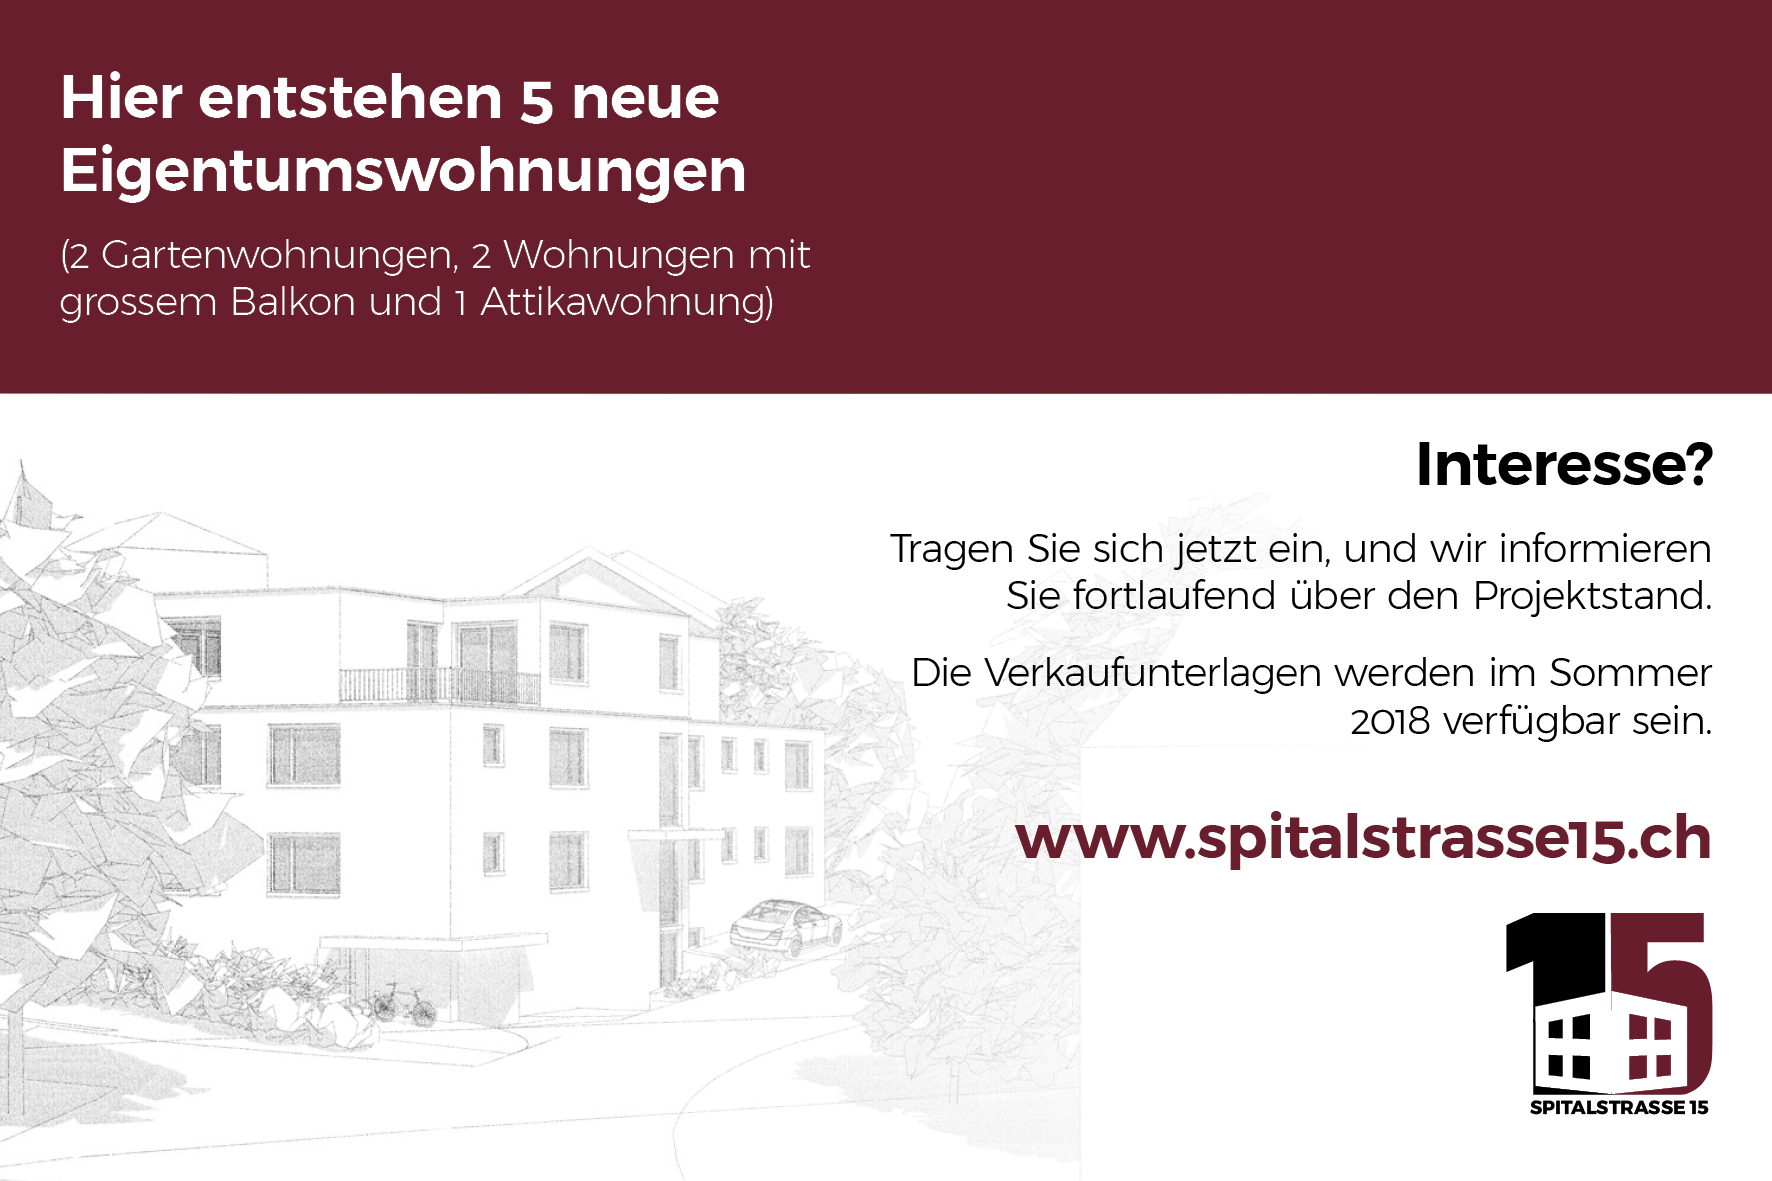 Bautafel_Spitalstrasse15